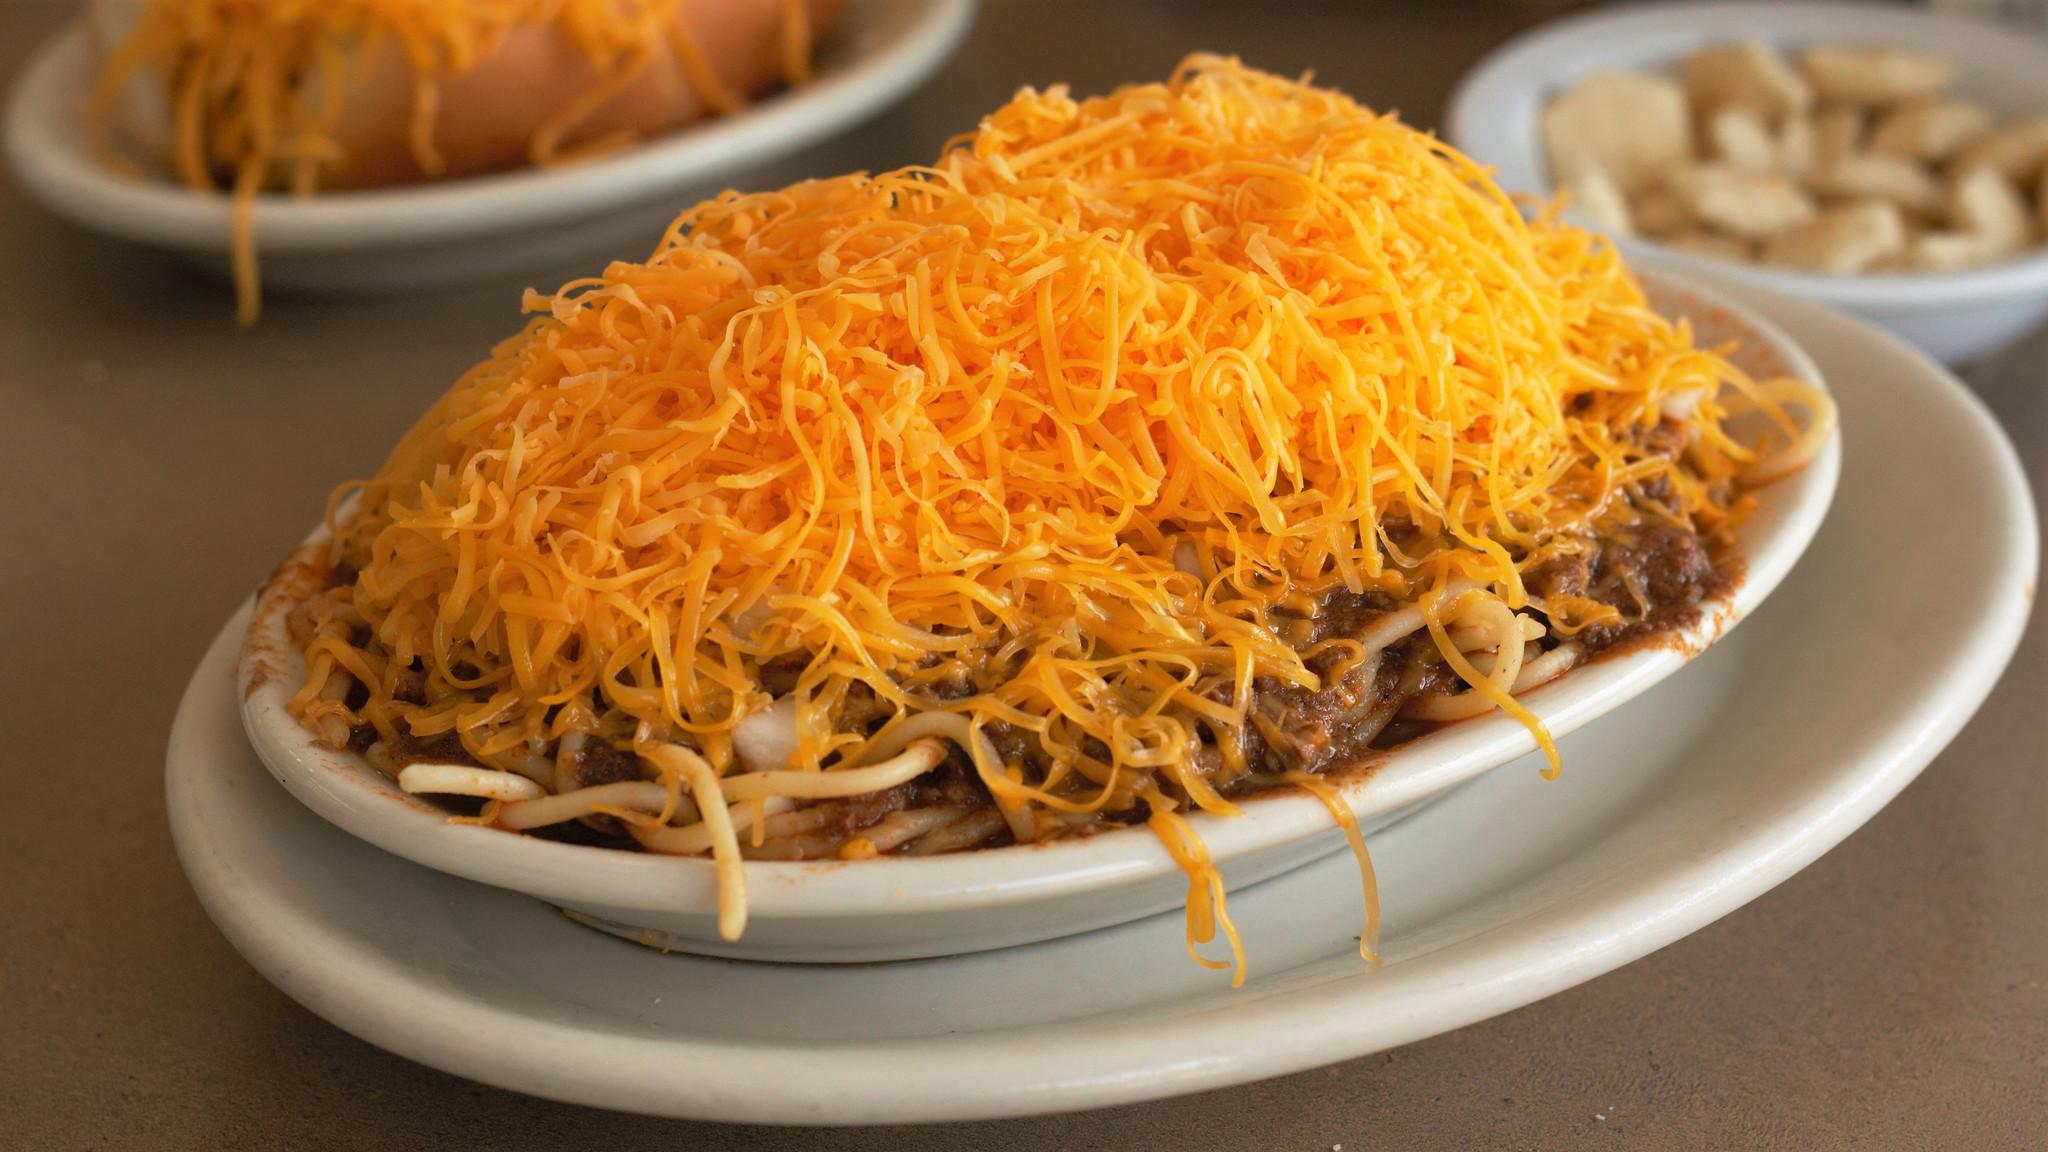 Is Cincinnati chili actually chili? A dive into the city's most famous dish